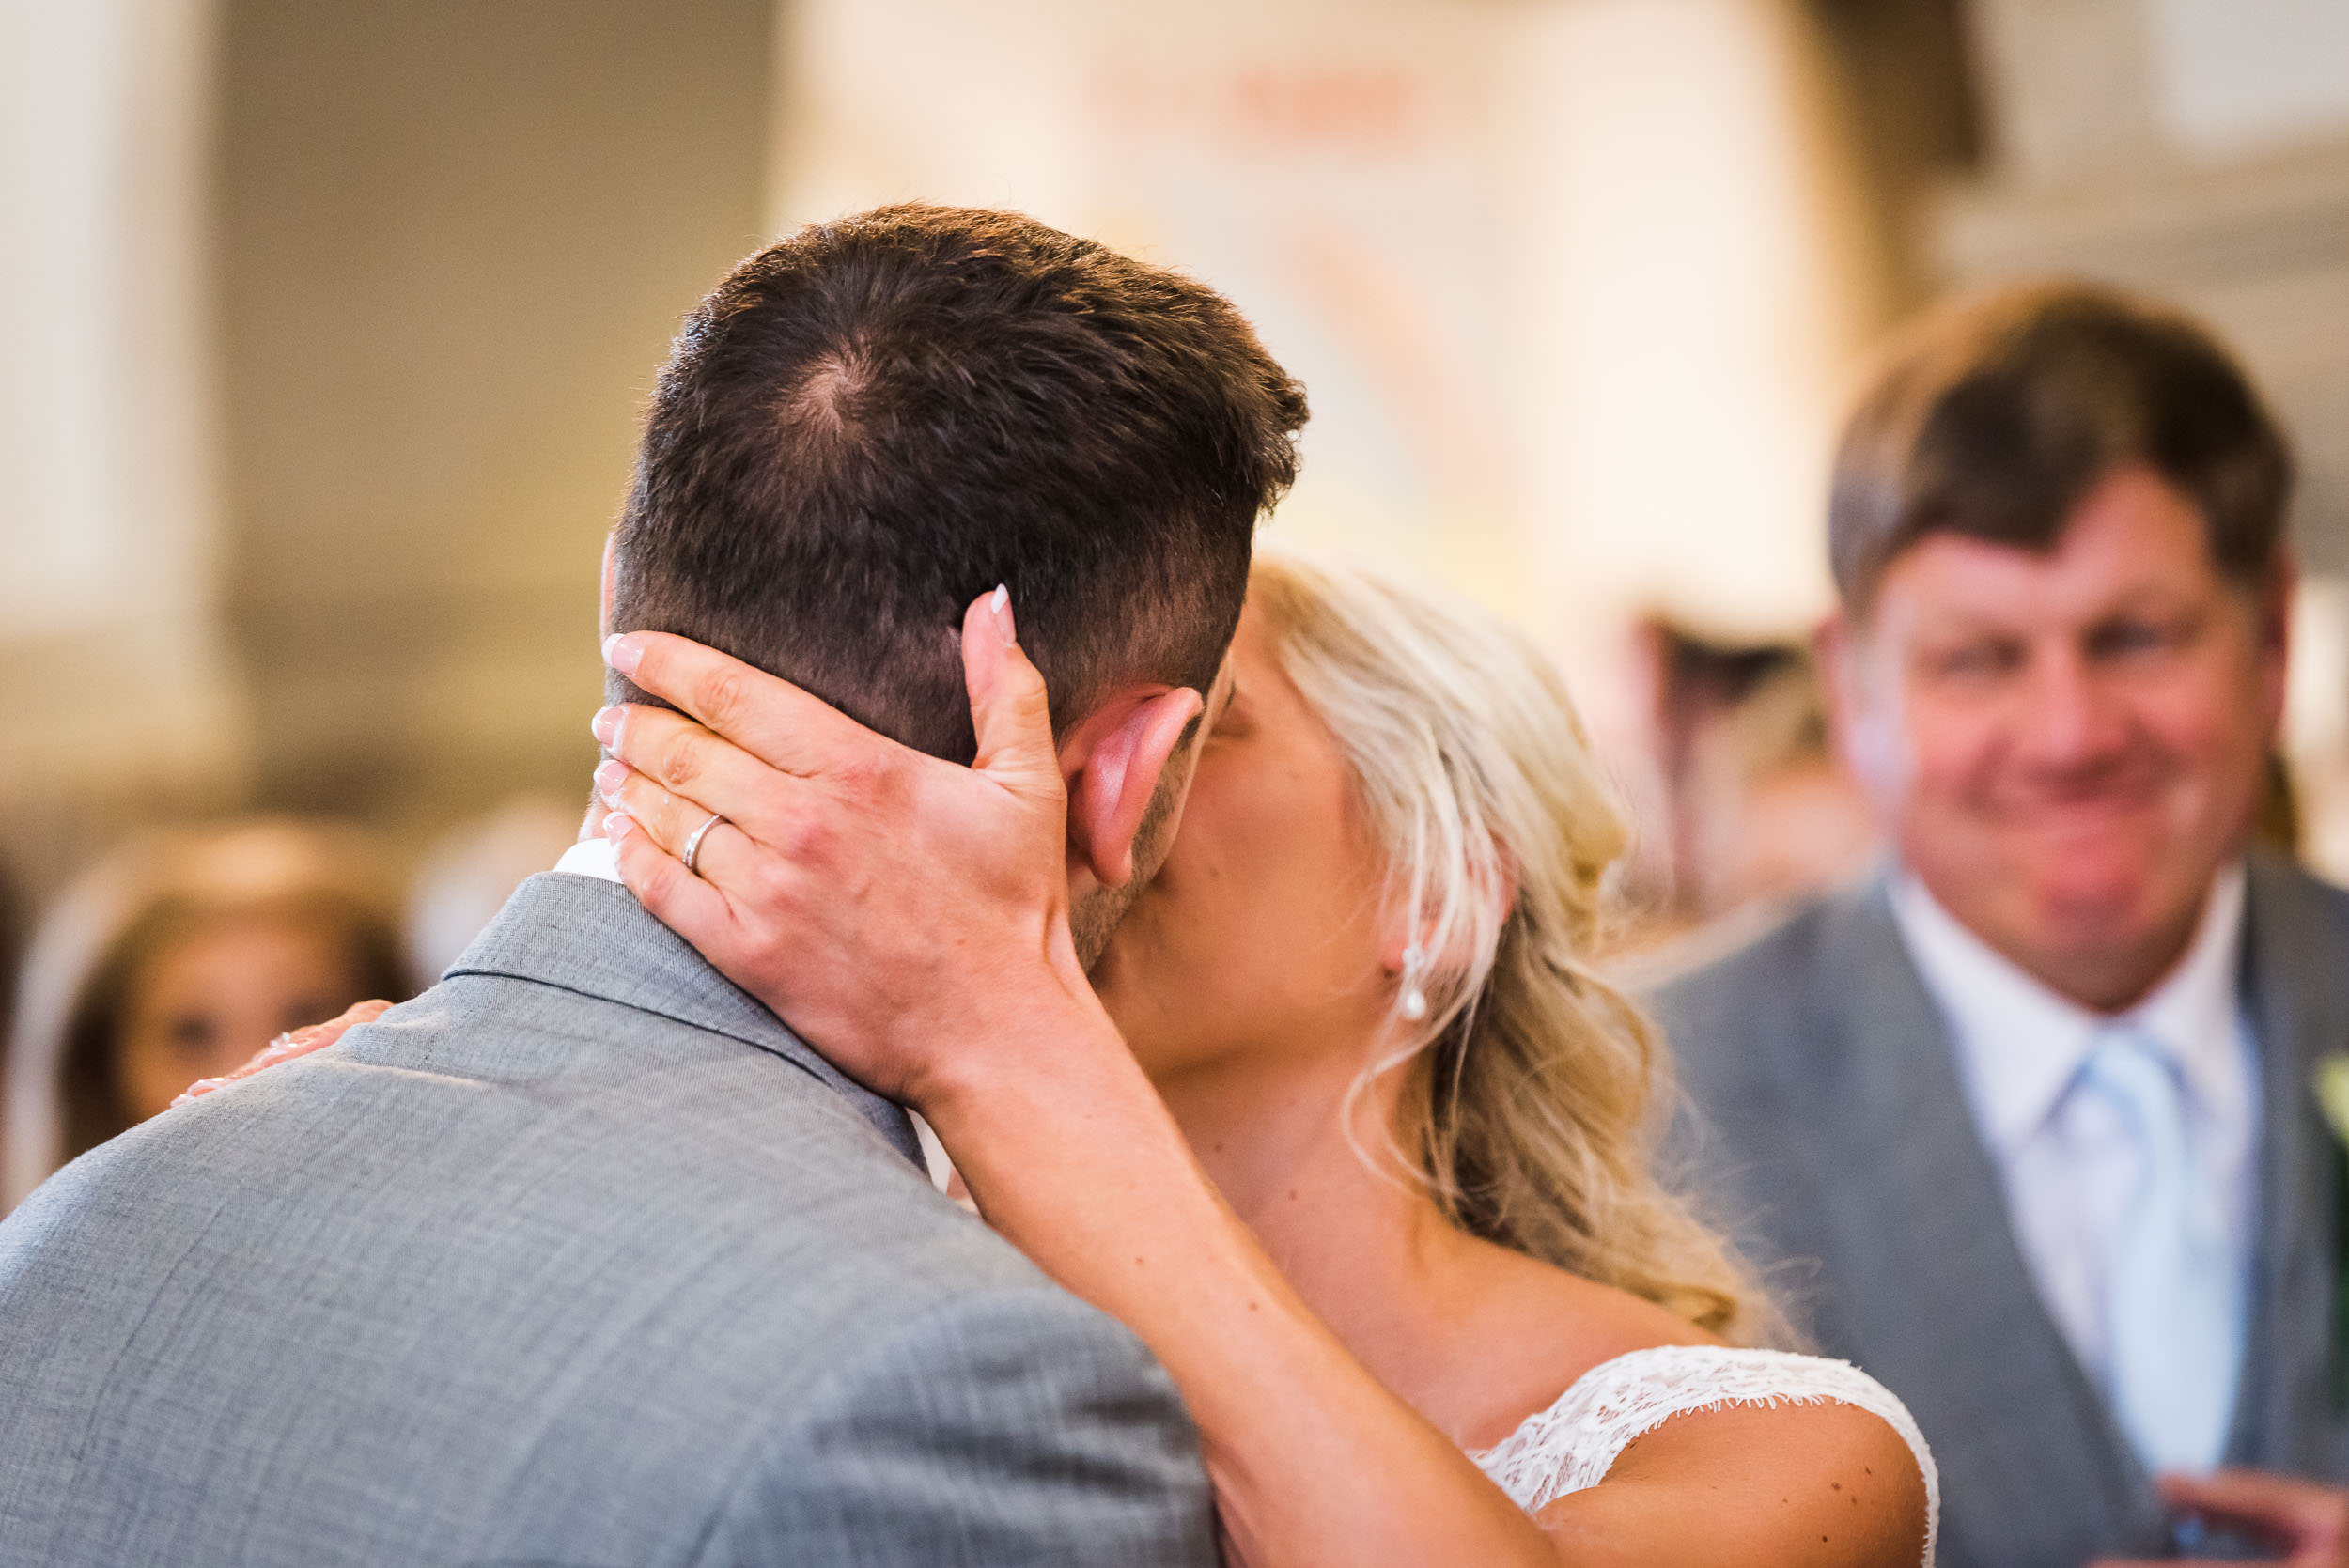 NC-20170722-sophie-and-jonny-wedding-0199.jpg